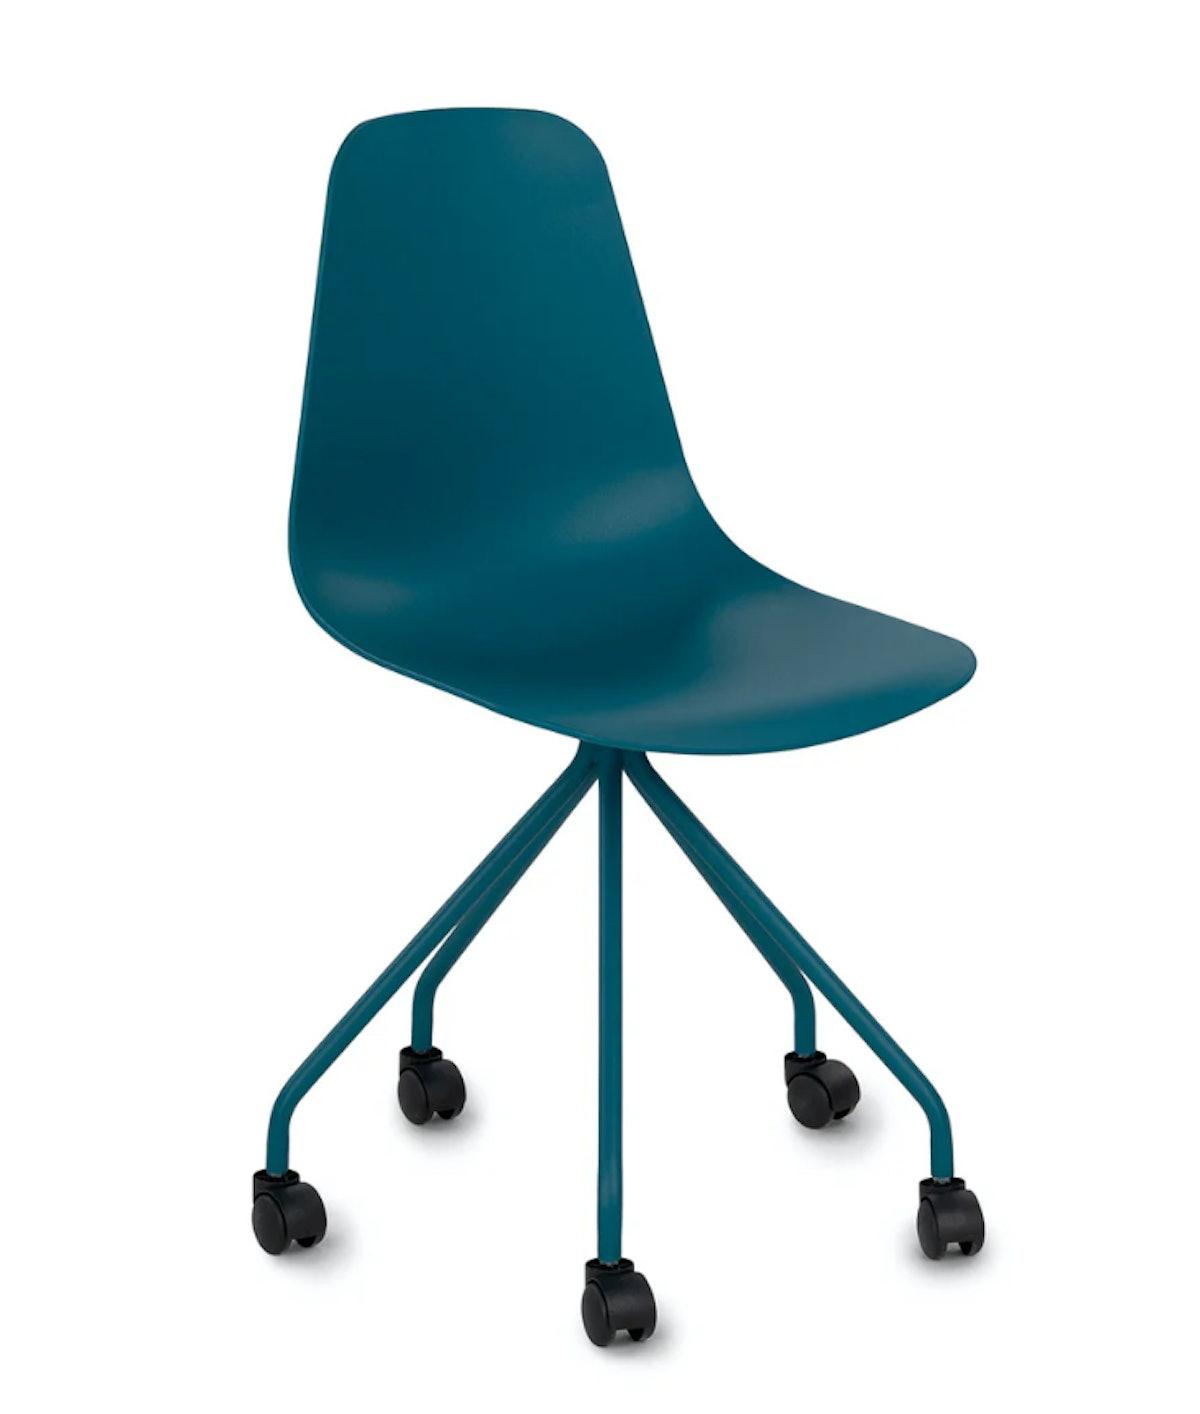 Svelti Deep Cove Teal Office Chair